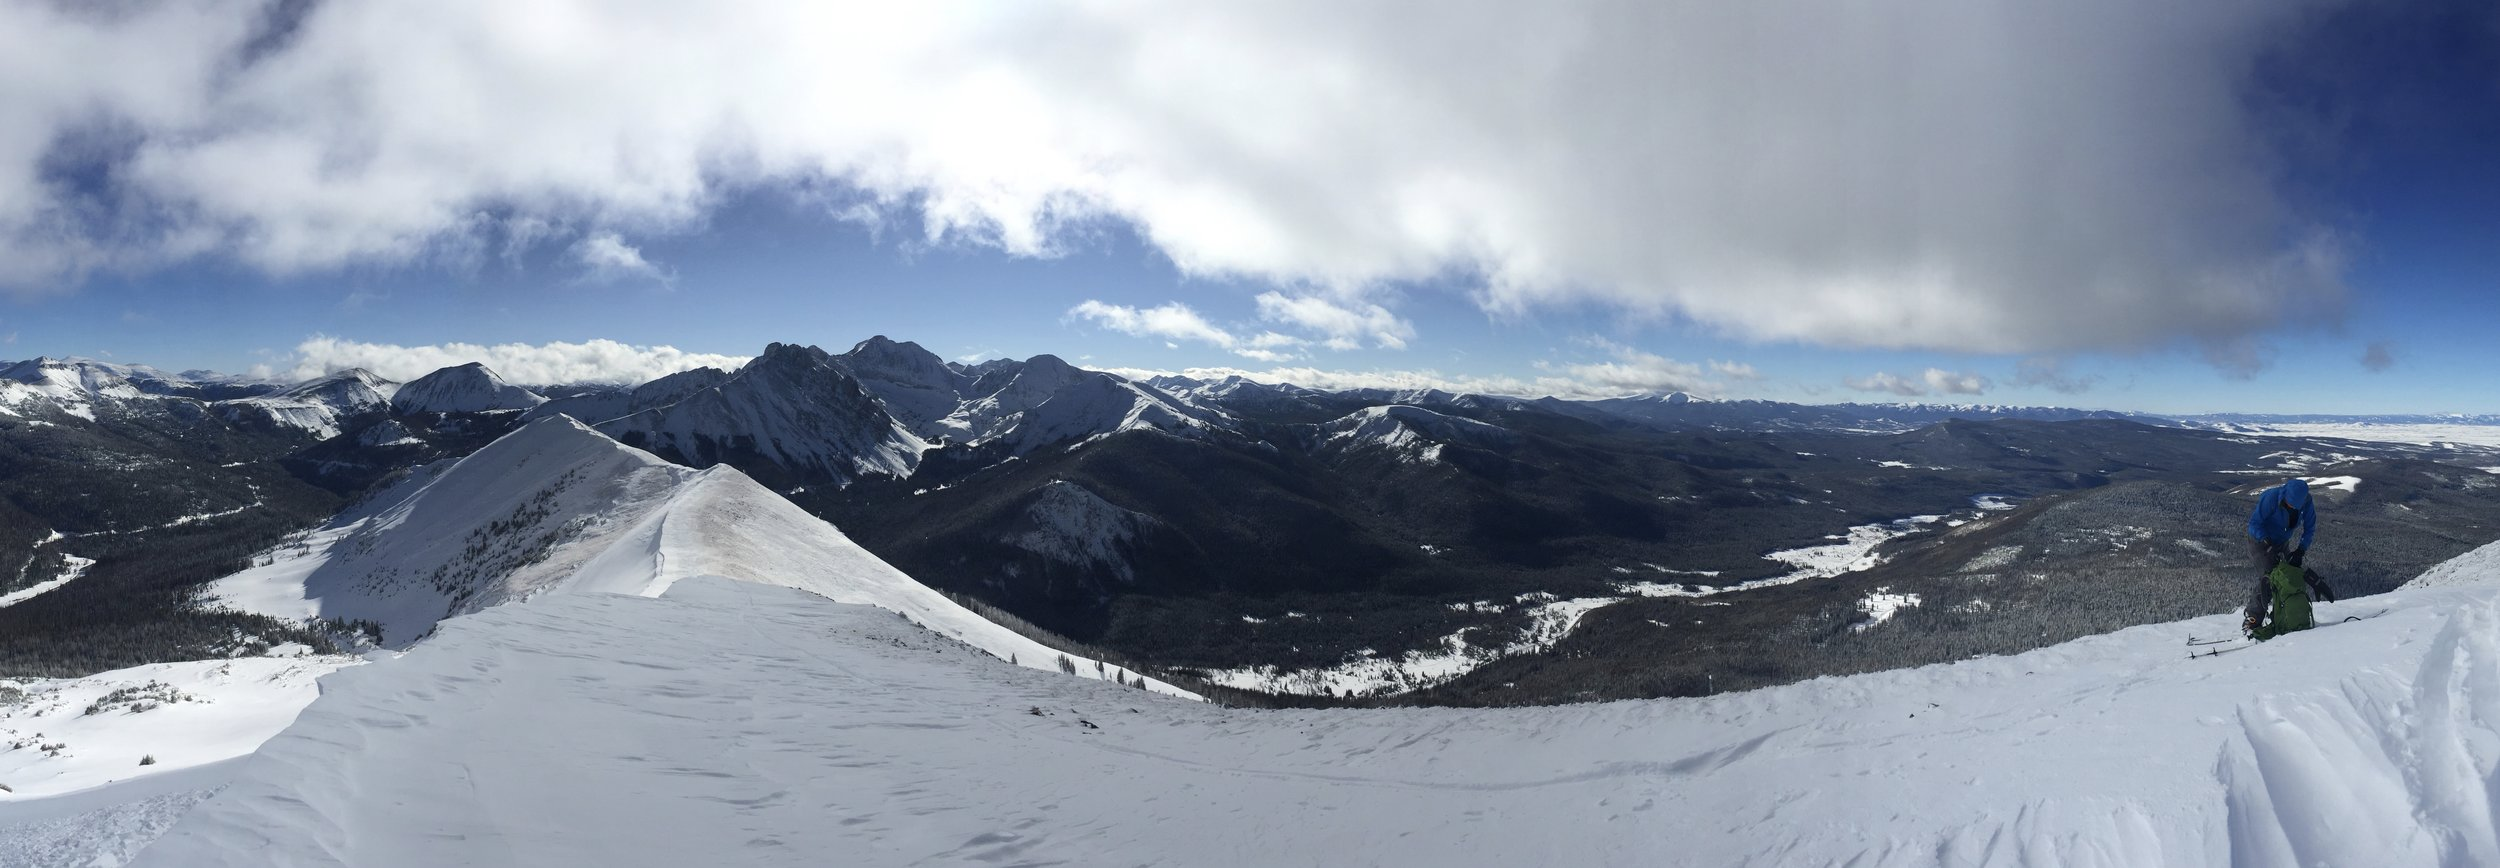 Ripping skins on N Diamond Peak, Cameron Pass Dec 2016